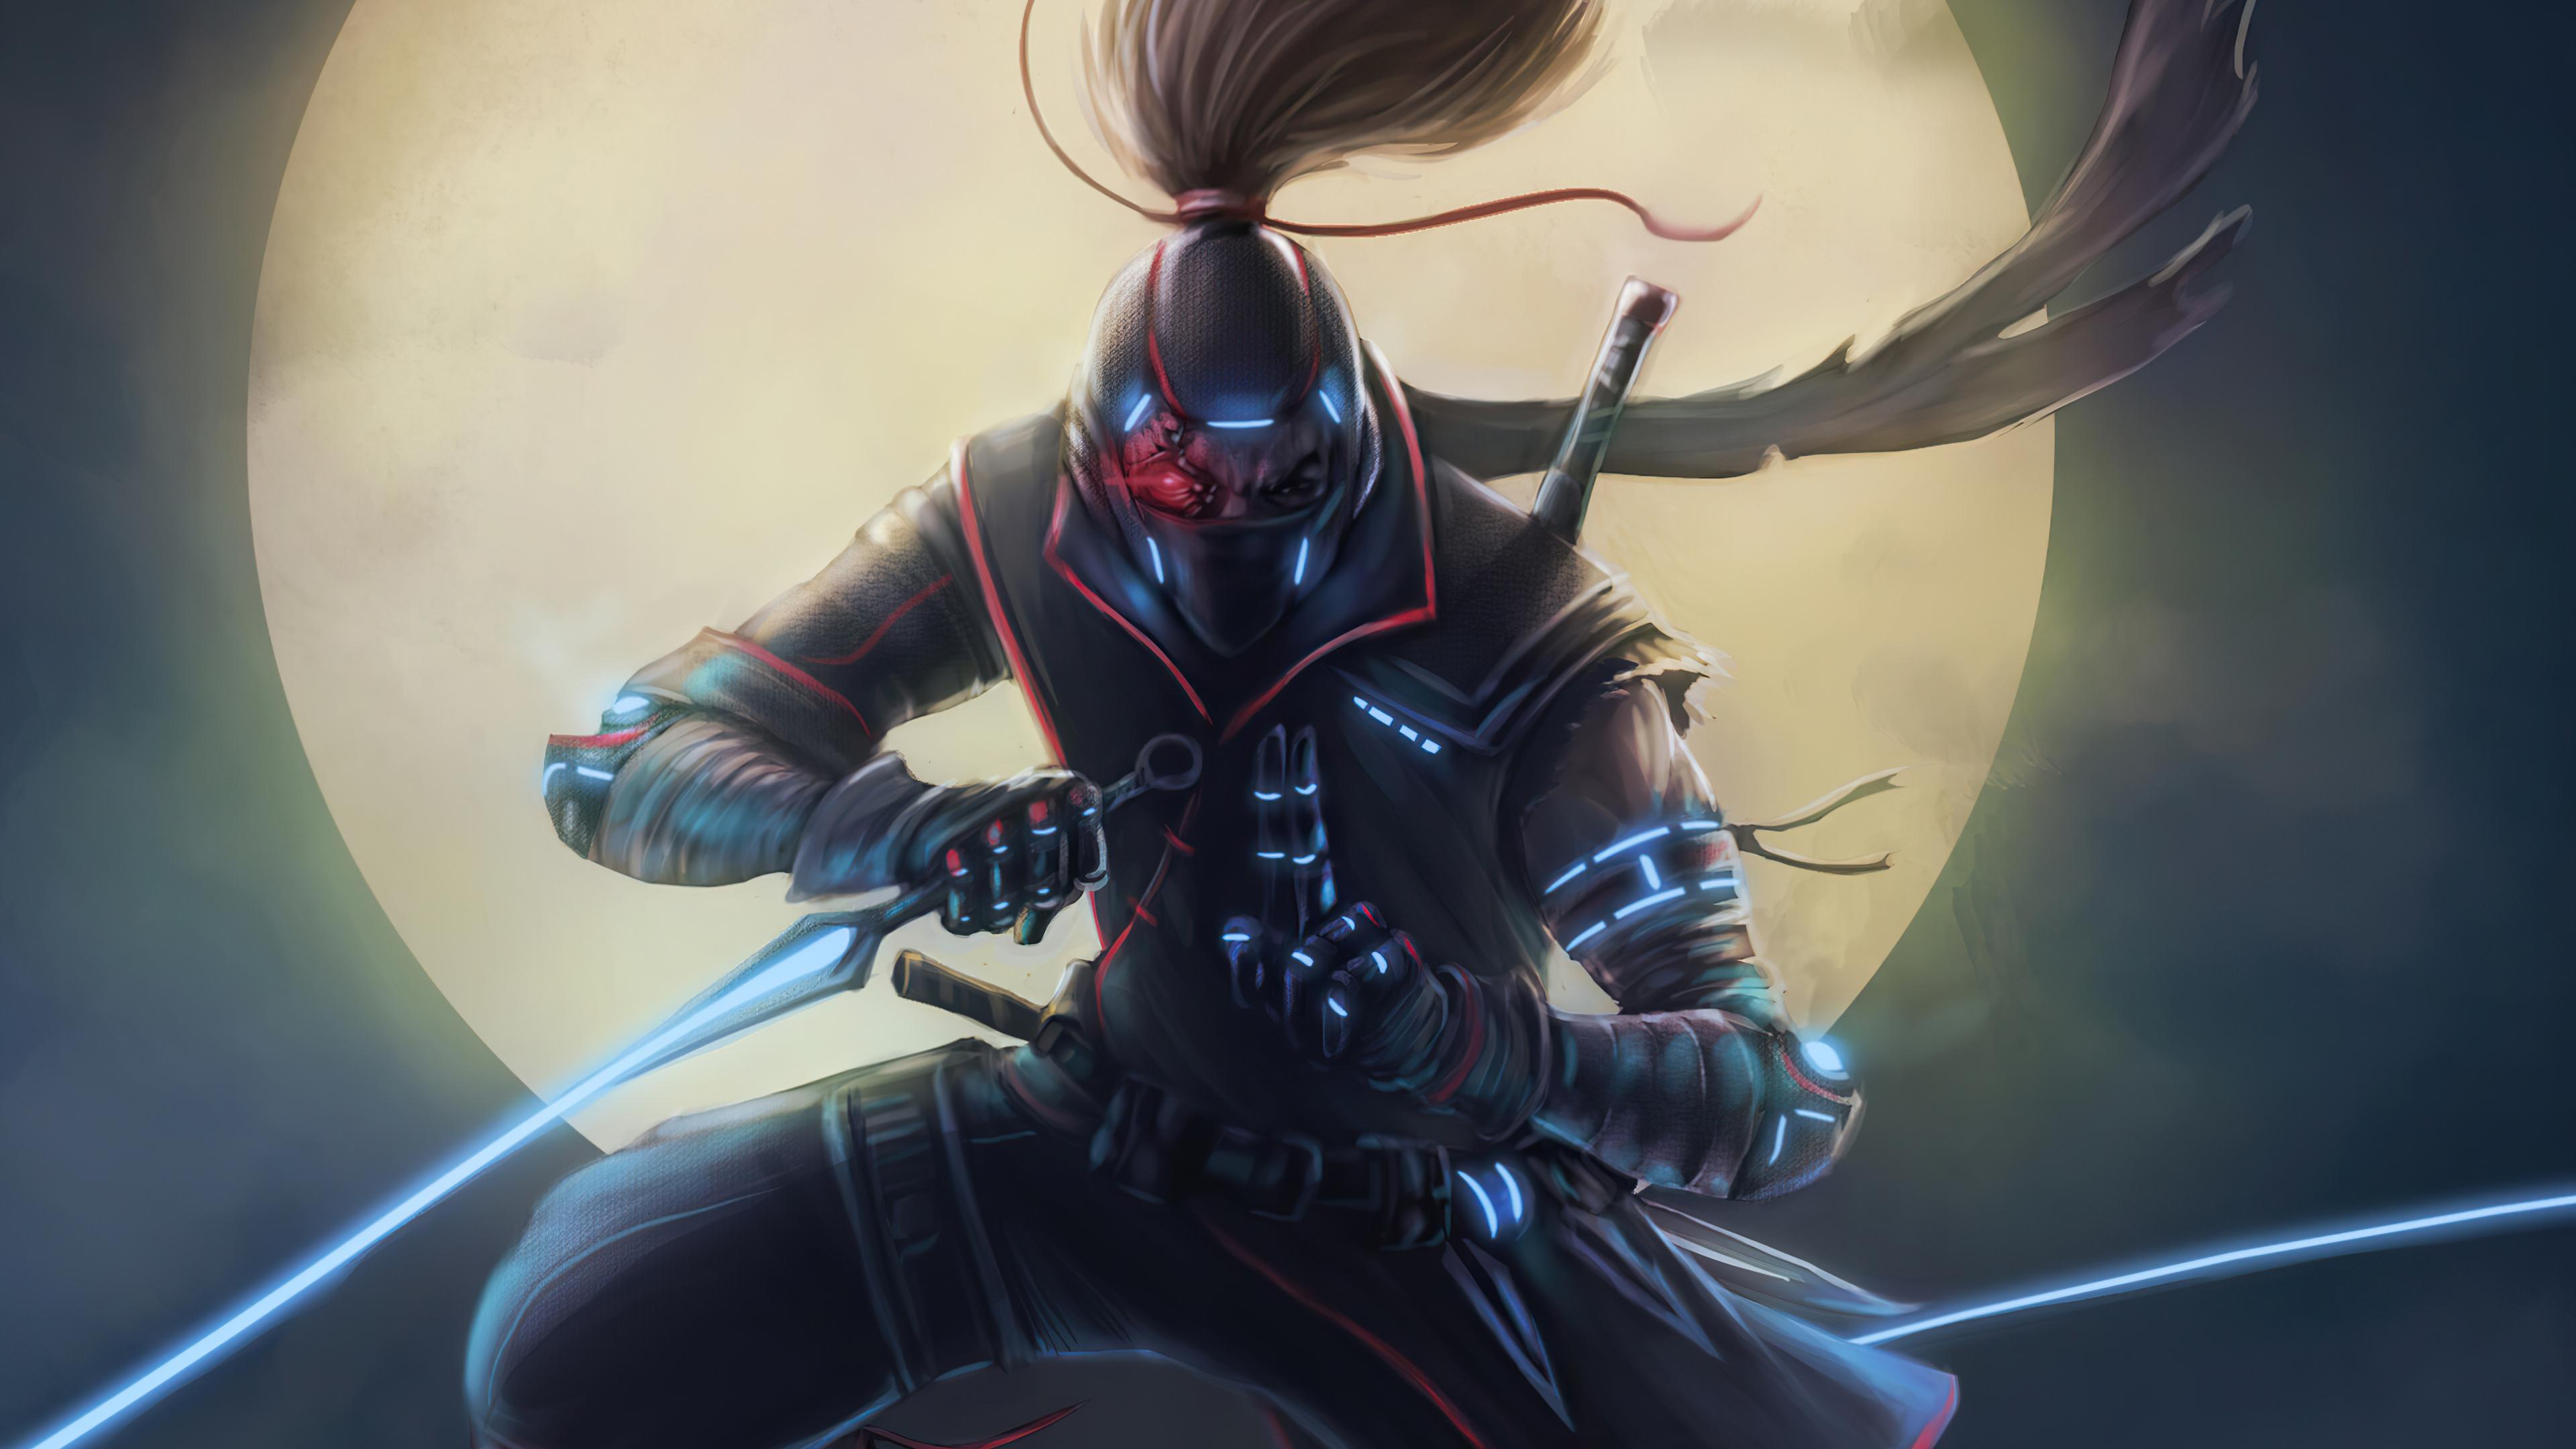 Cyberpunk Ninja Warrior Wallpaper HD Artist 4K Wallpapers Images 3840x2160